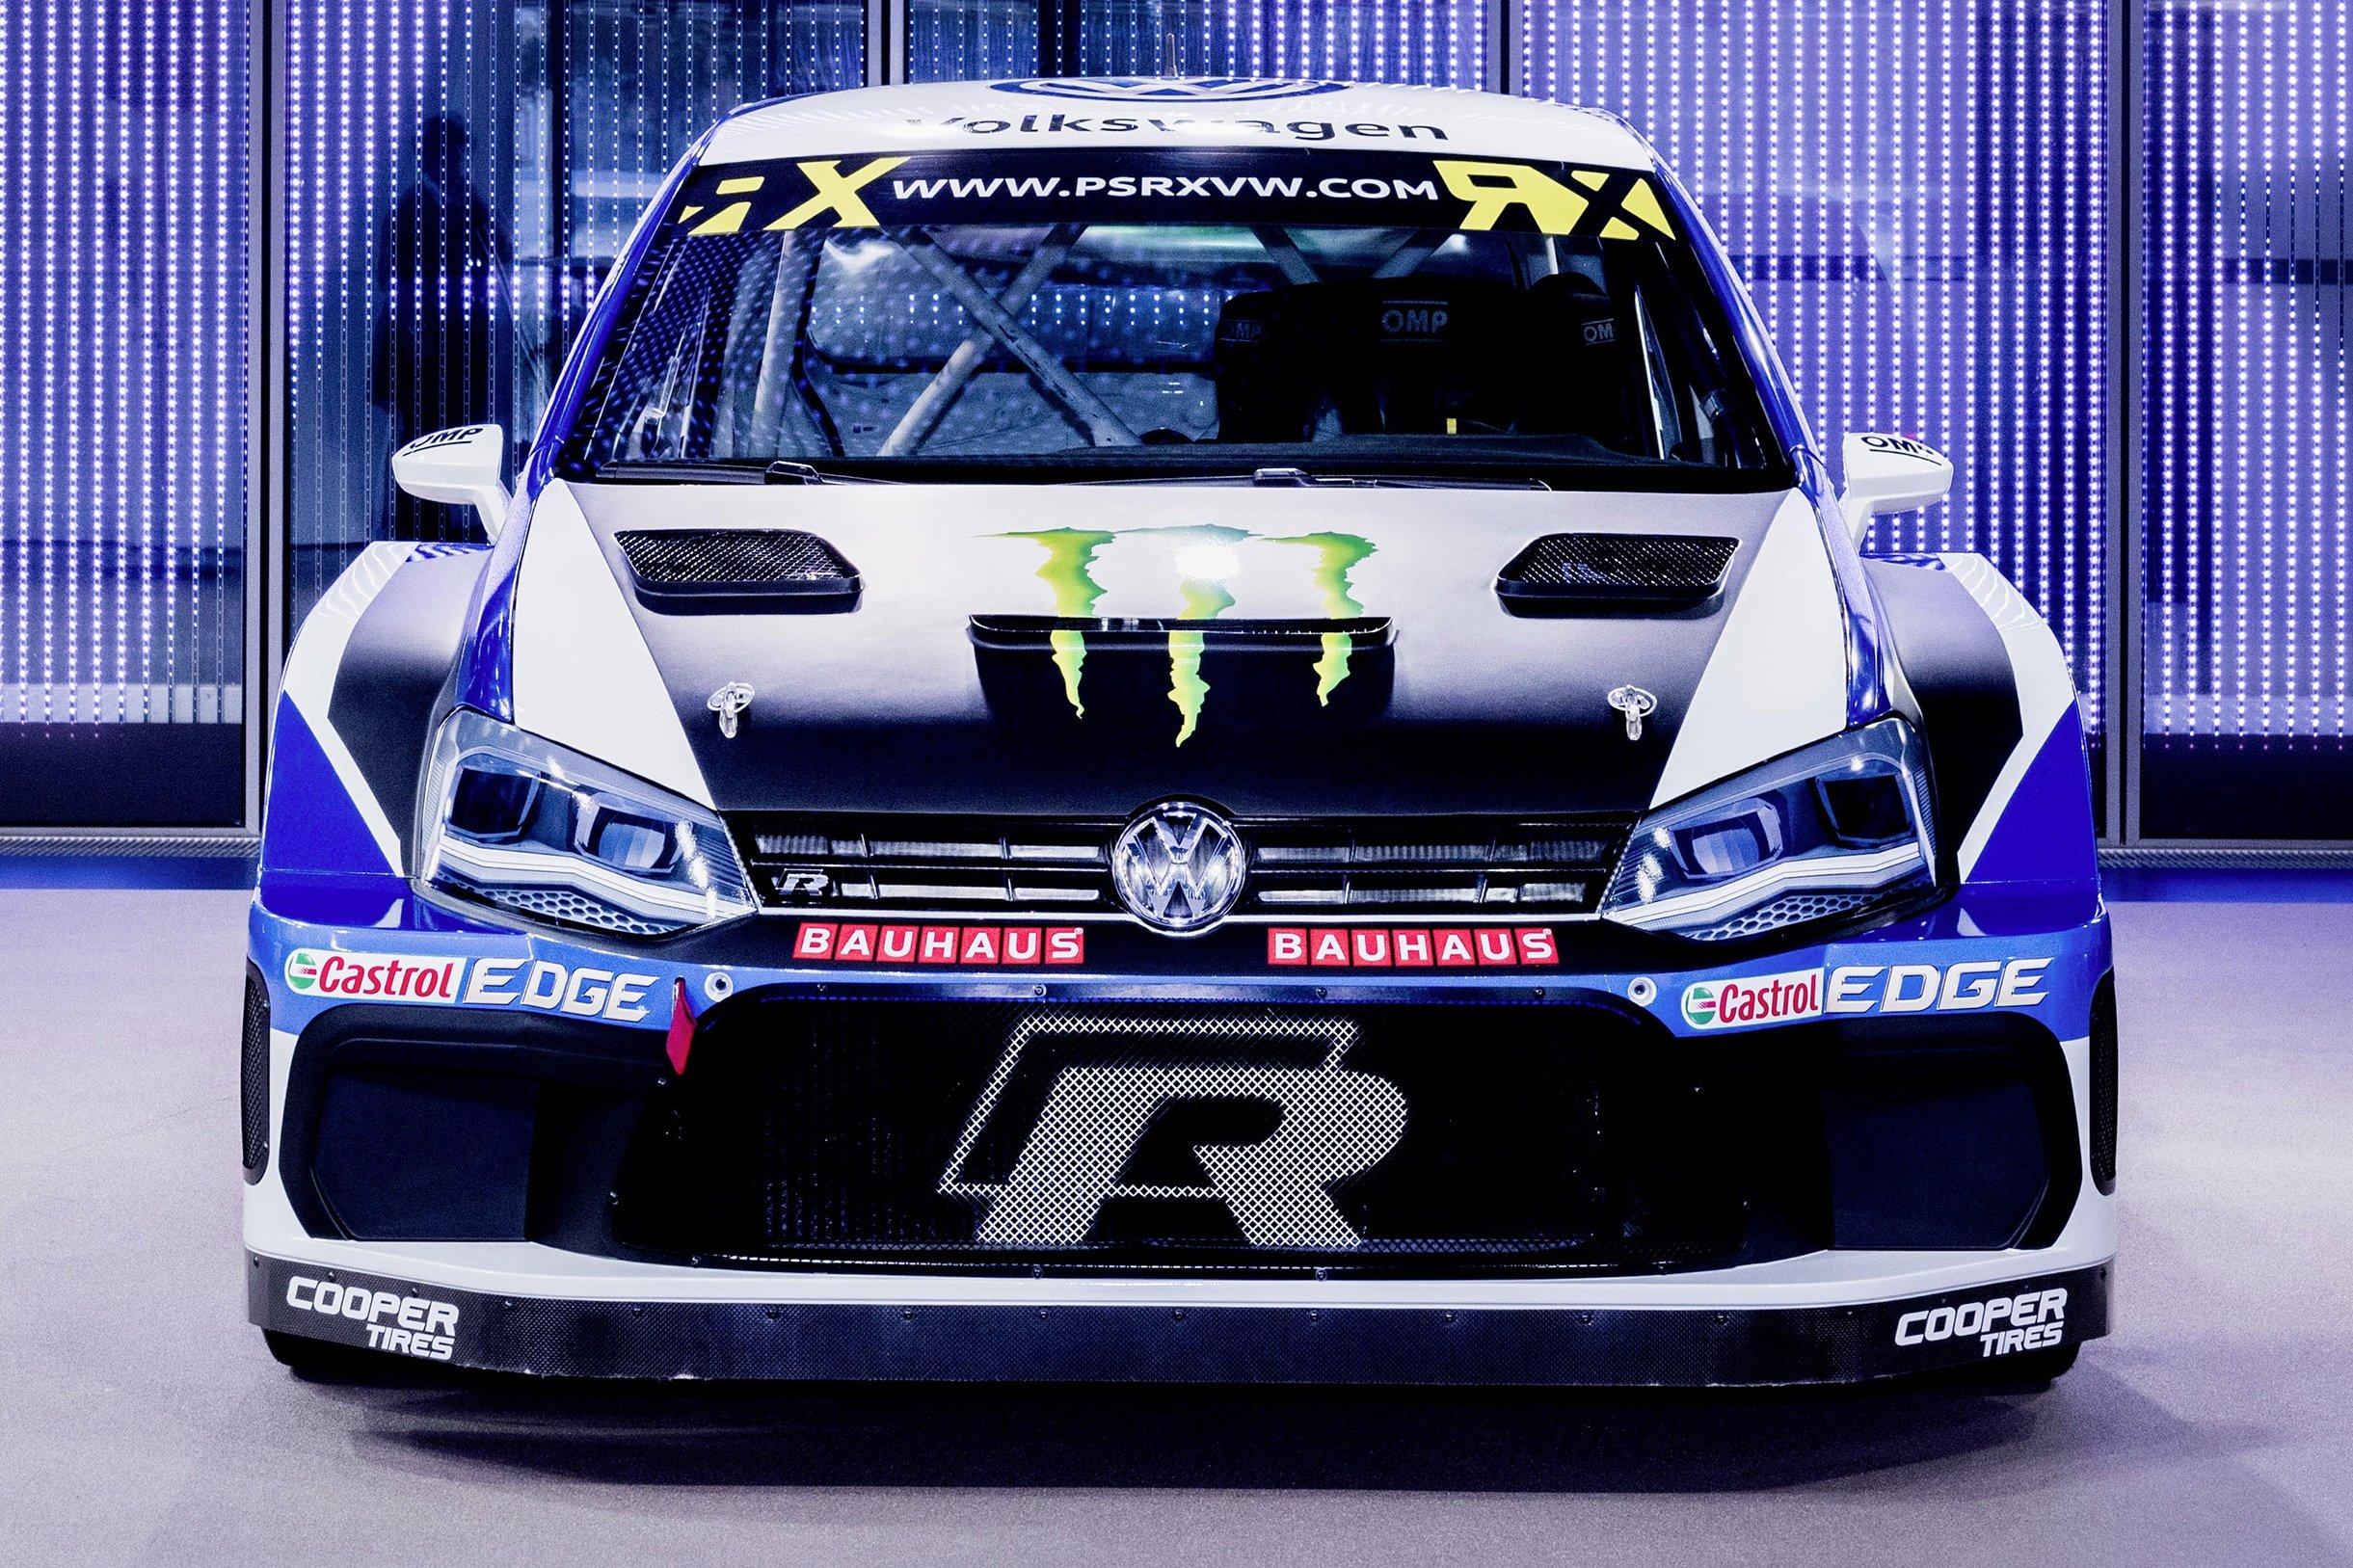 volkswagen polo r supercar 570 hp rallycross car. Black Bedroom Furniture Sets. Home Design Ideas